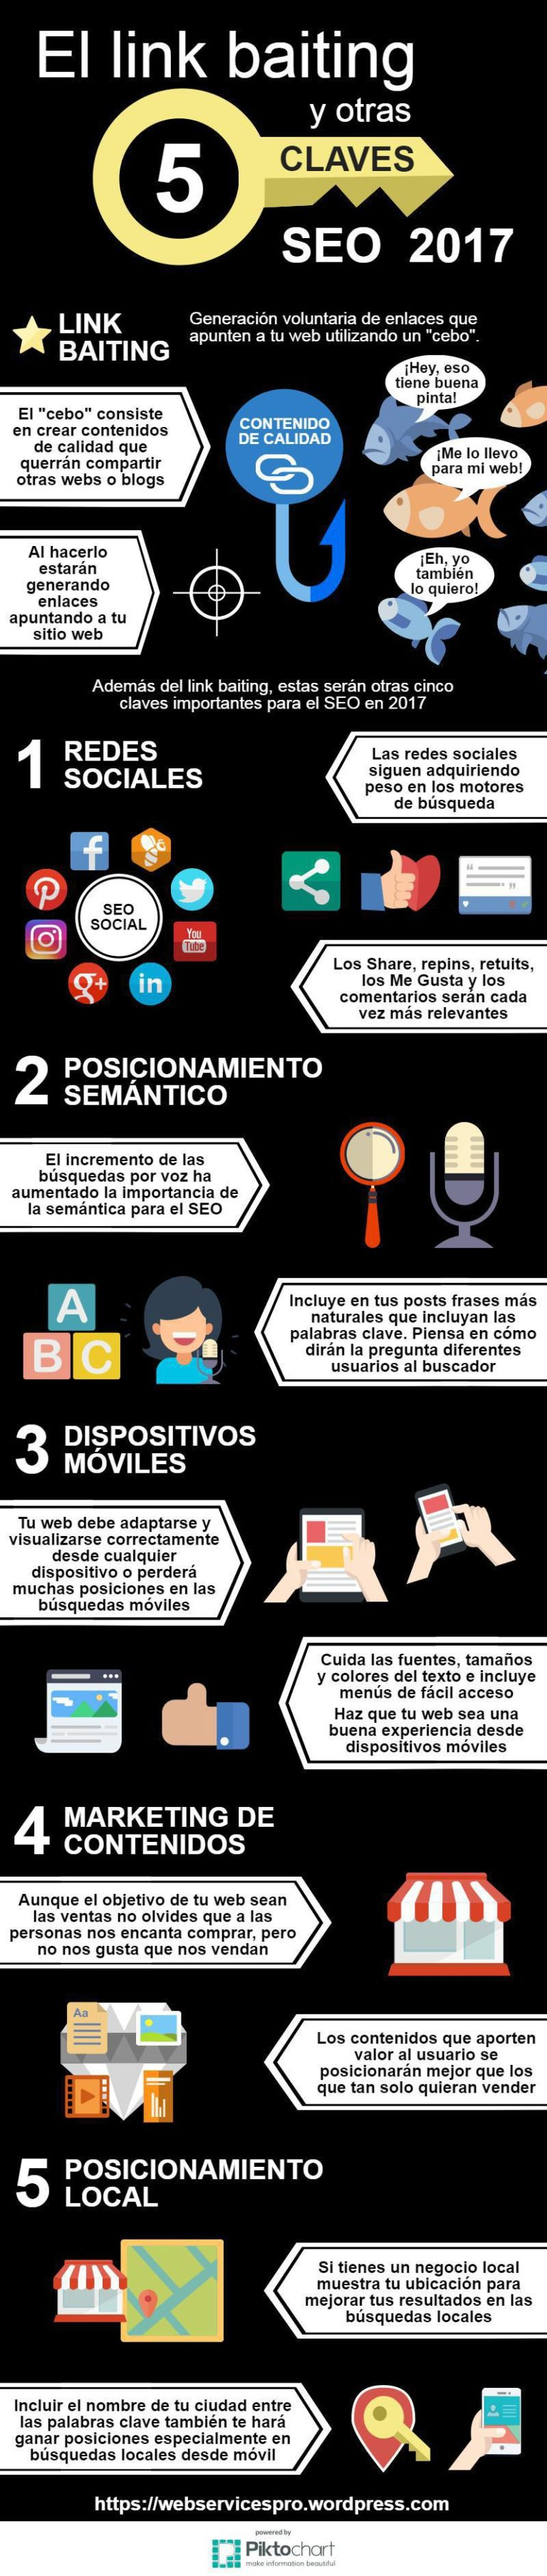 Tendencias de posicionamiento en buscadores SEO 2017 Infografia en espanol